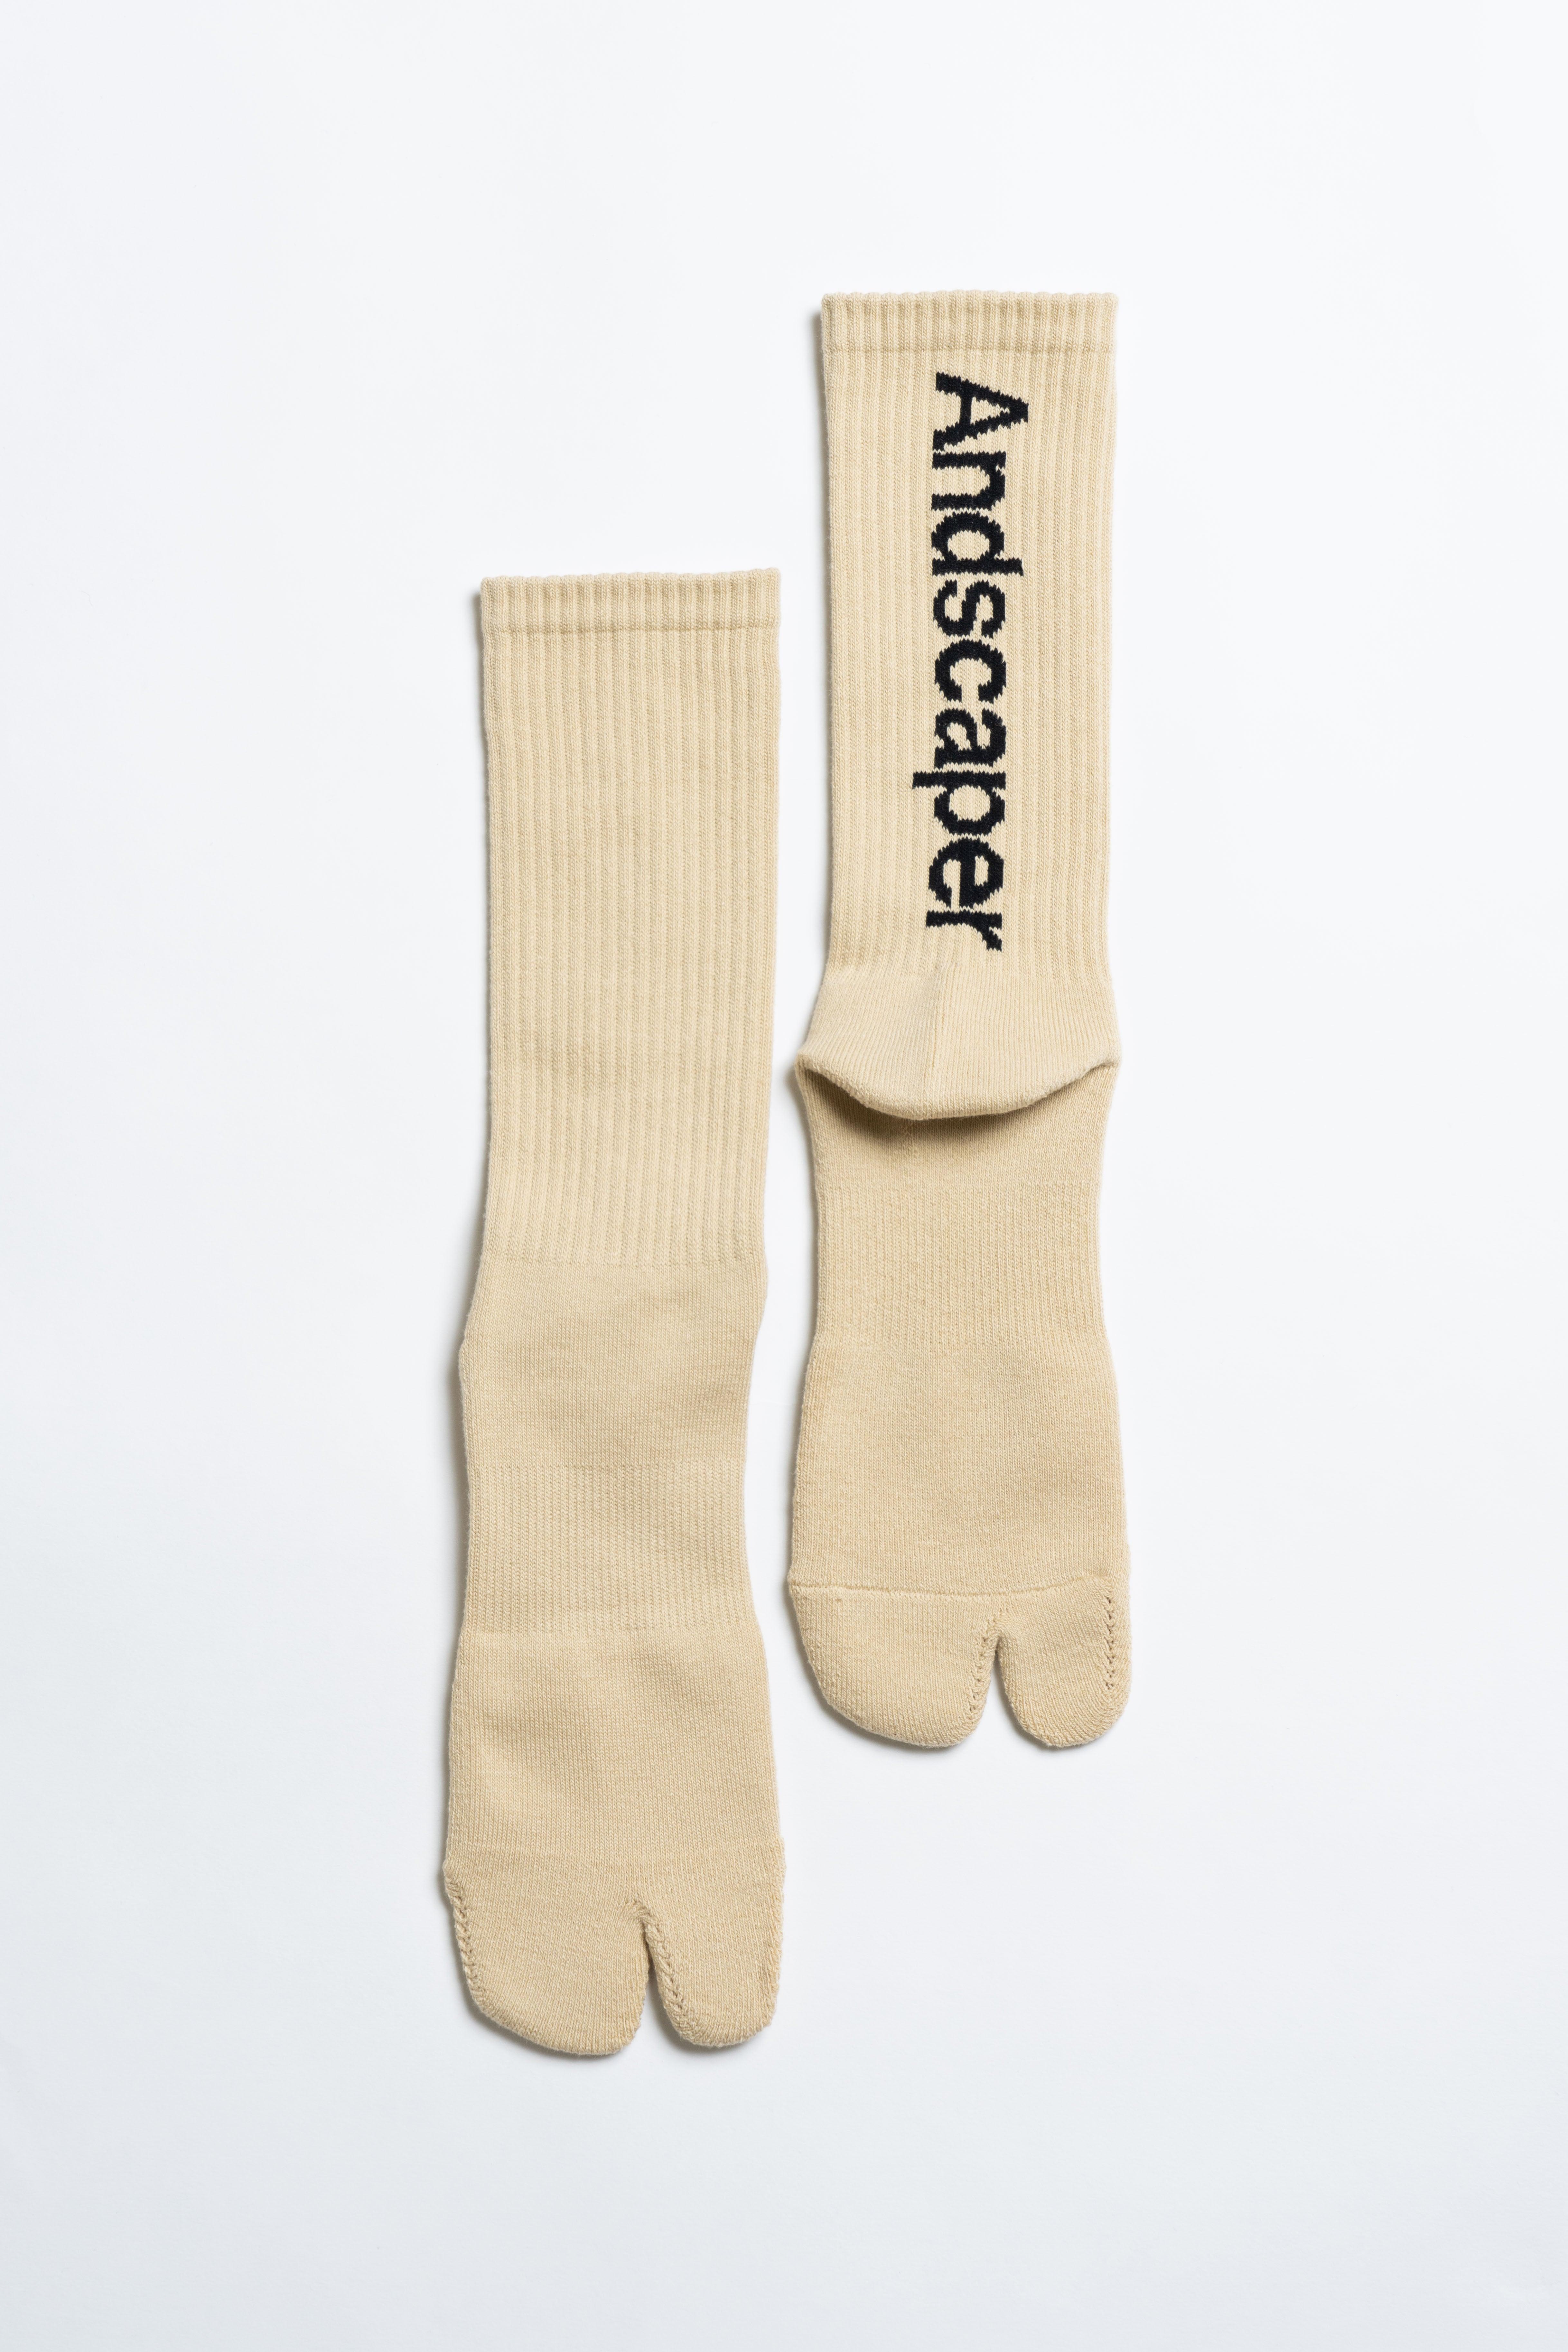 Concept Logo Socks(Oatmeal × Black)